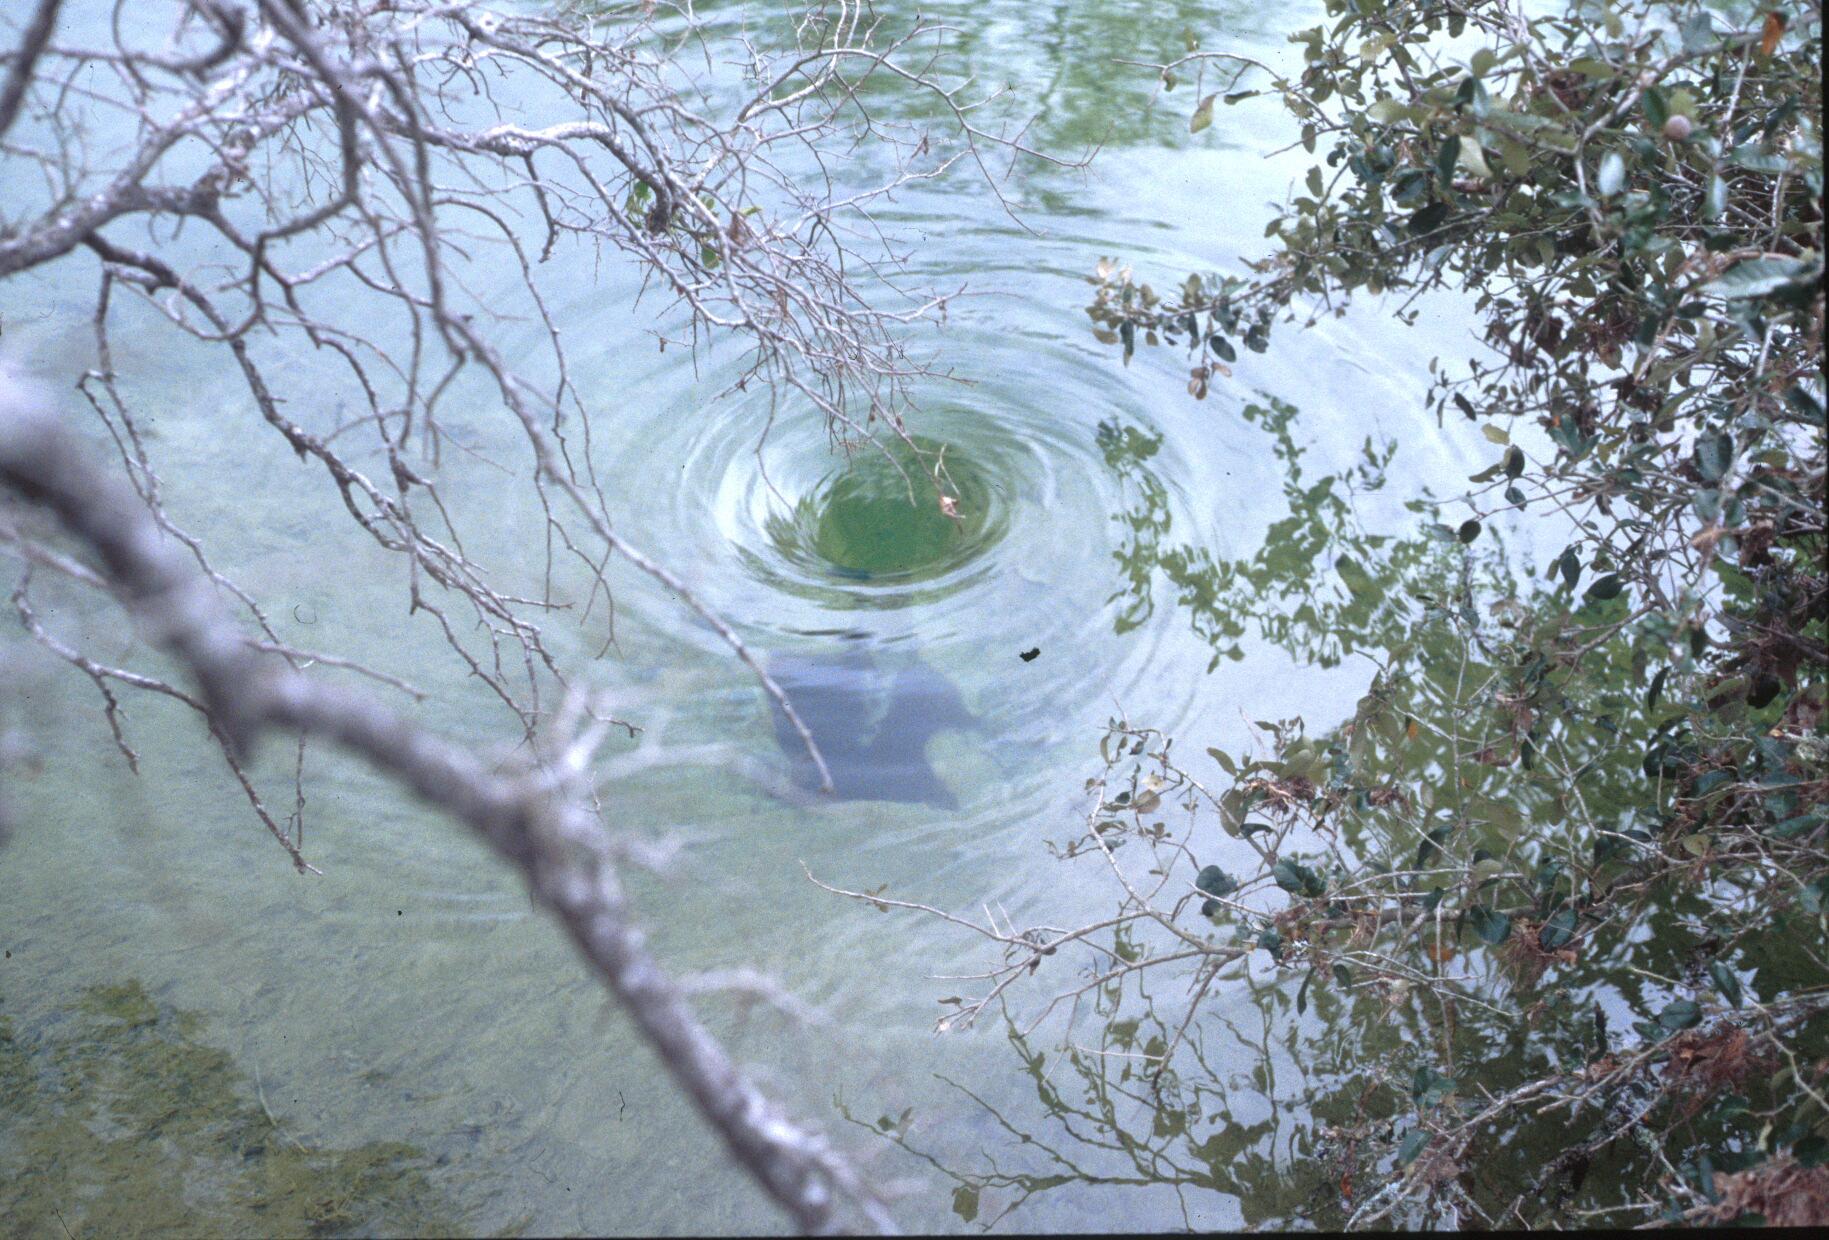 Whirlpool over Crippled Crawfish Cave